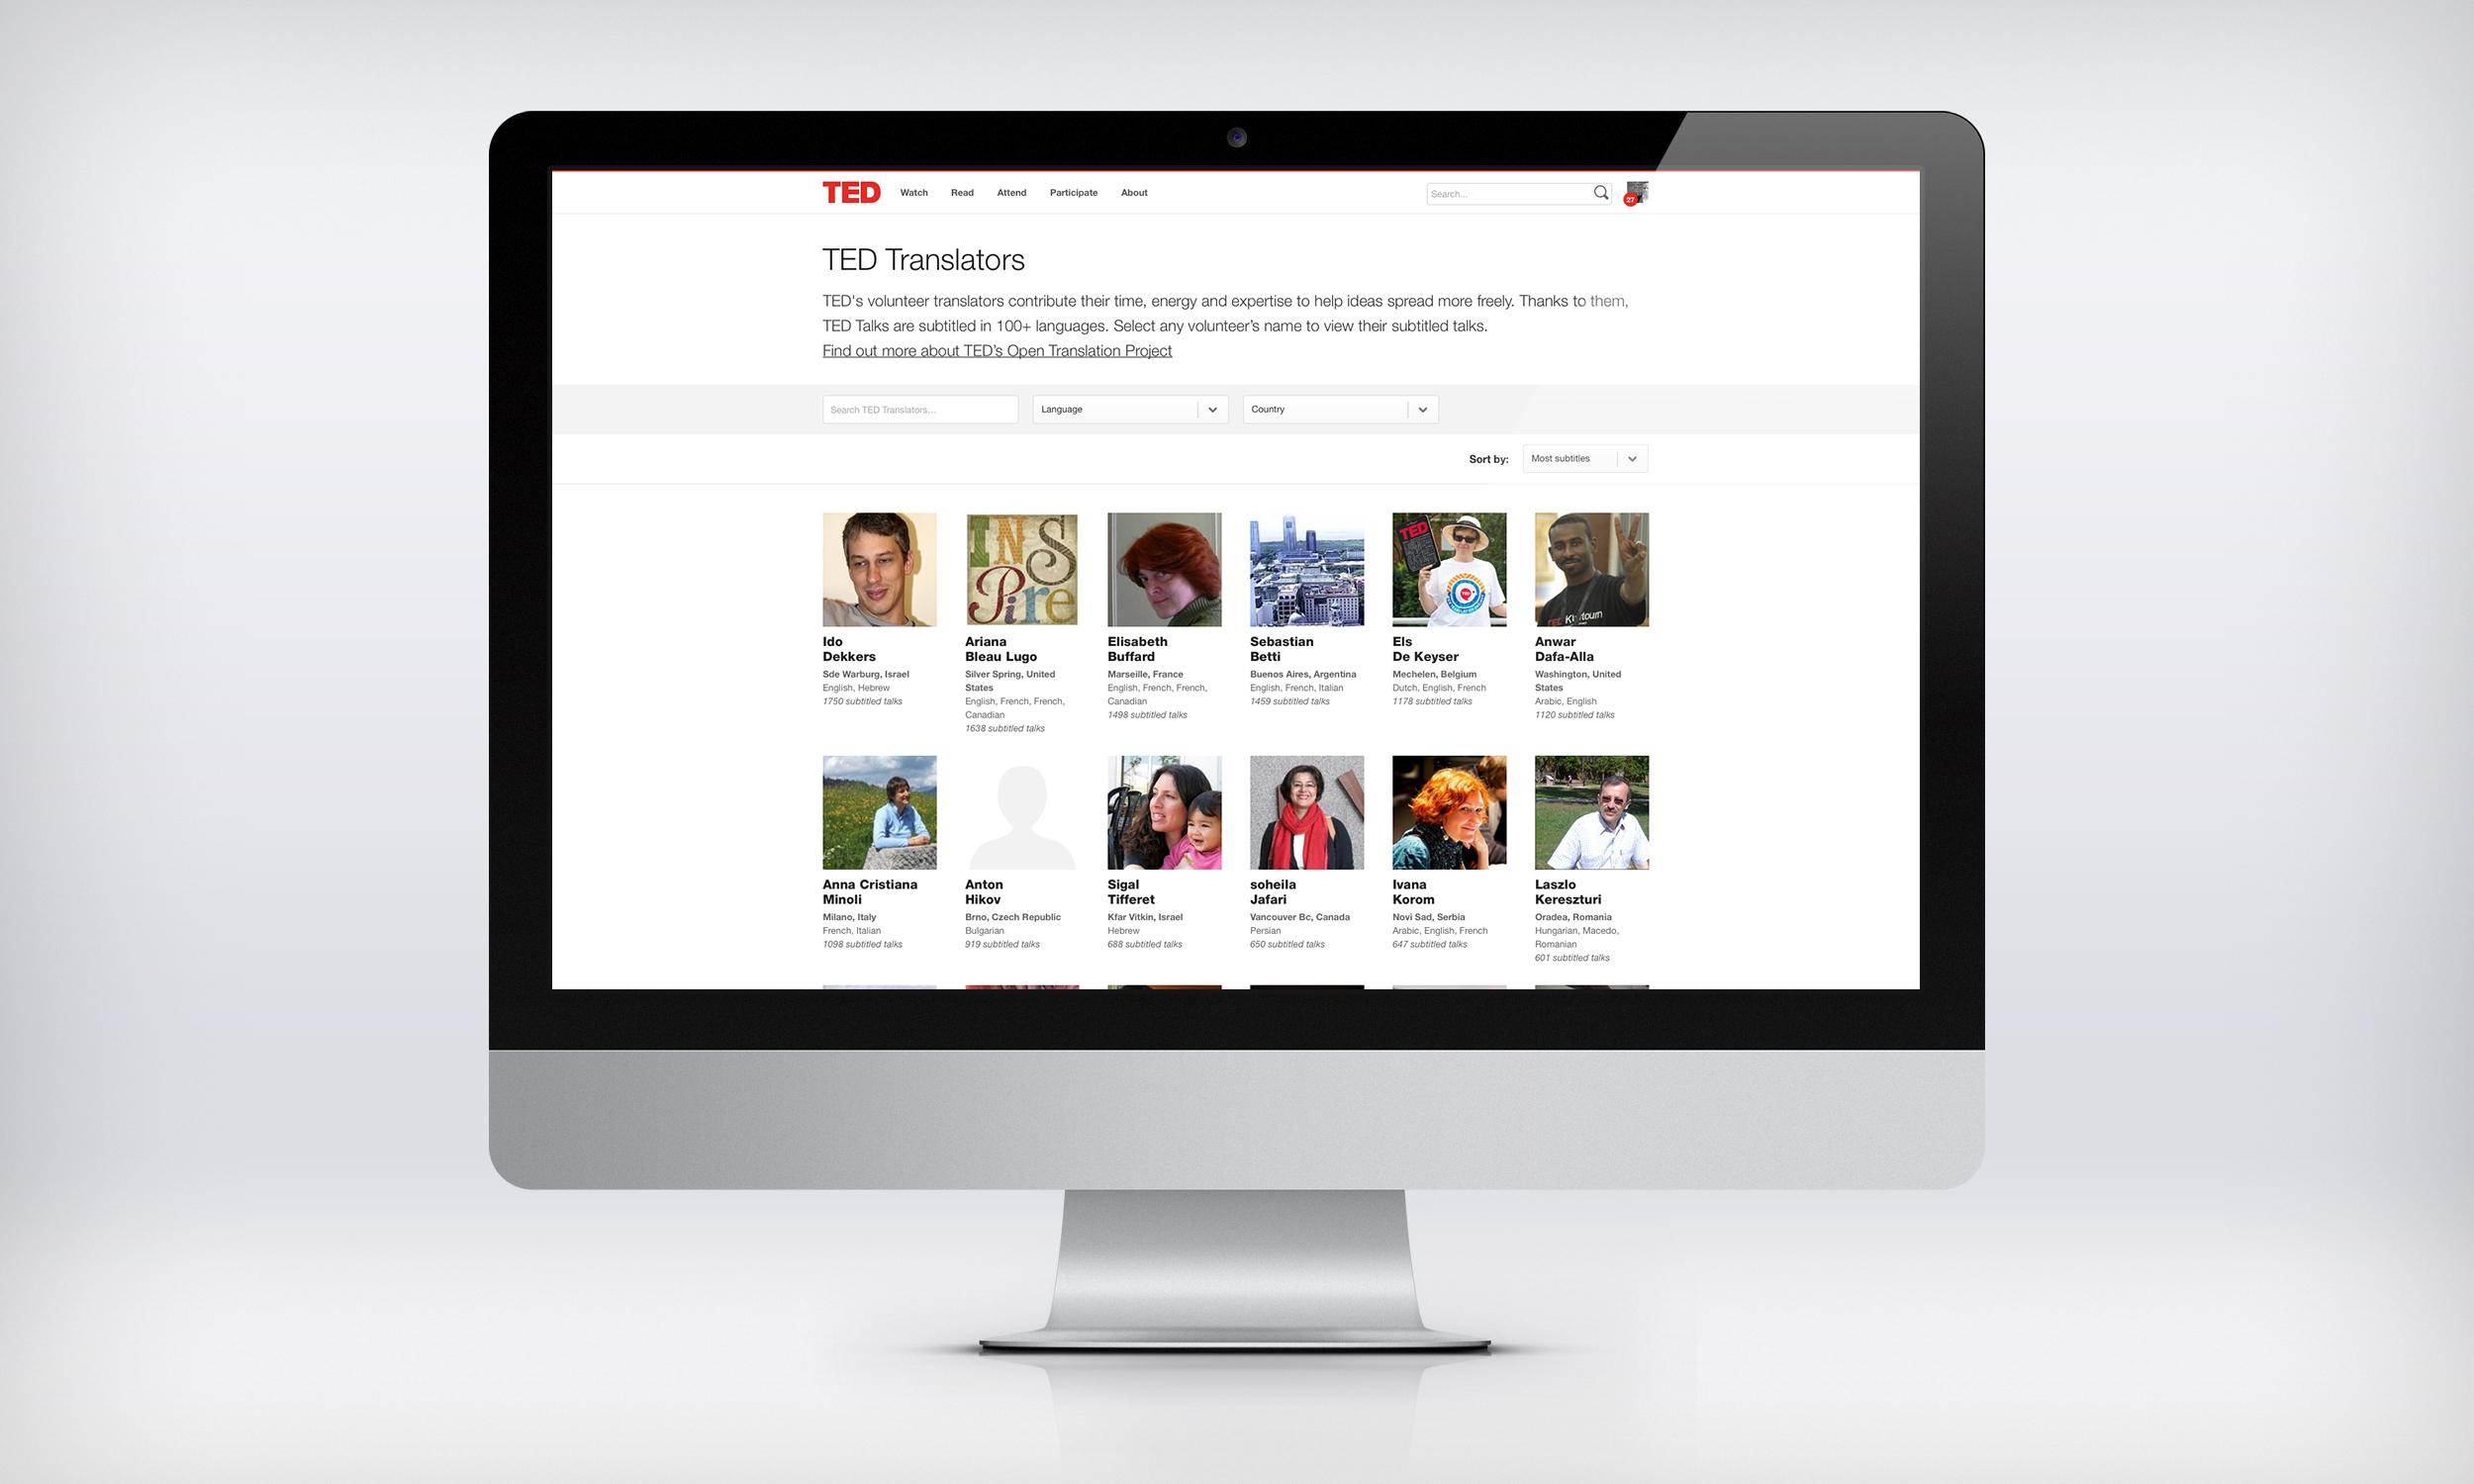 ted-translator-search.jpg